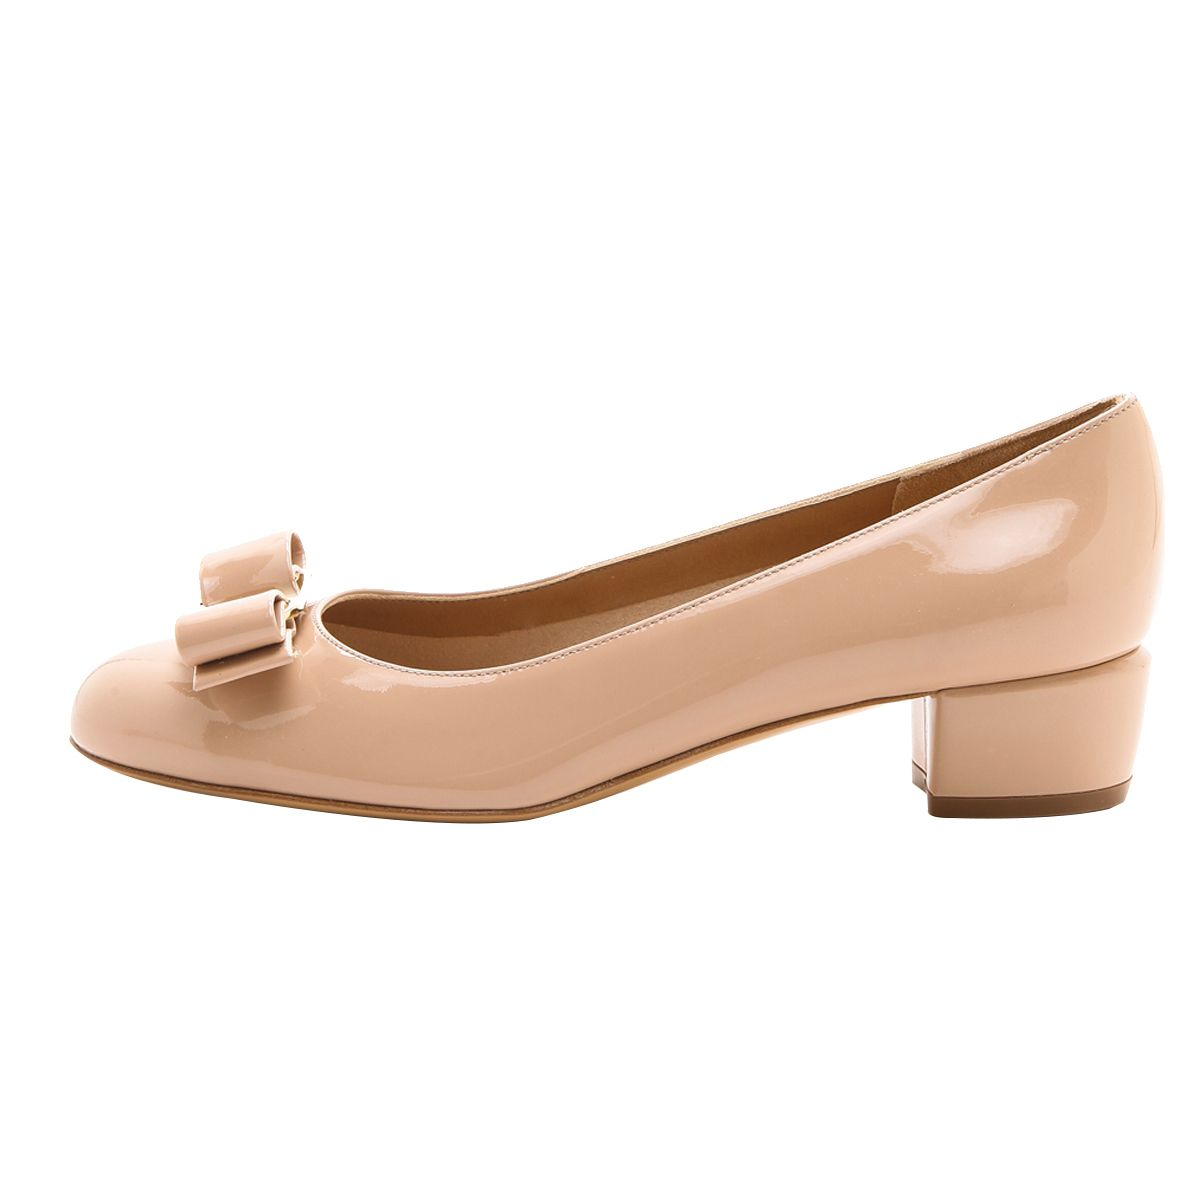 Patent Leather Women Ladies Pumps Block Heel Round Toe Bowtie Comfort Work Shoes